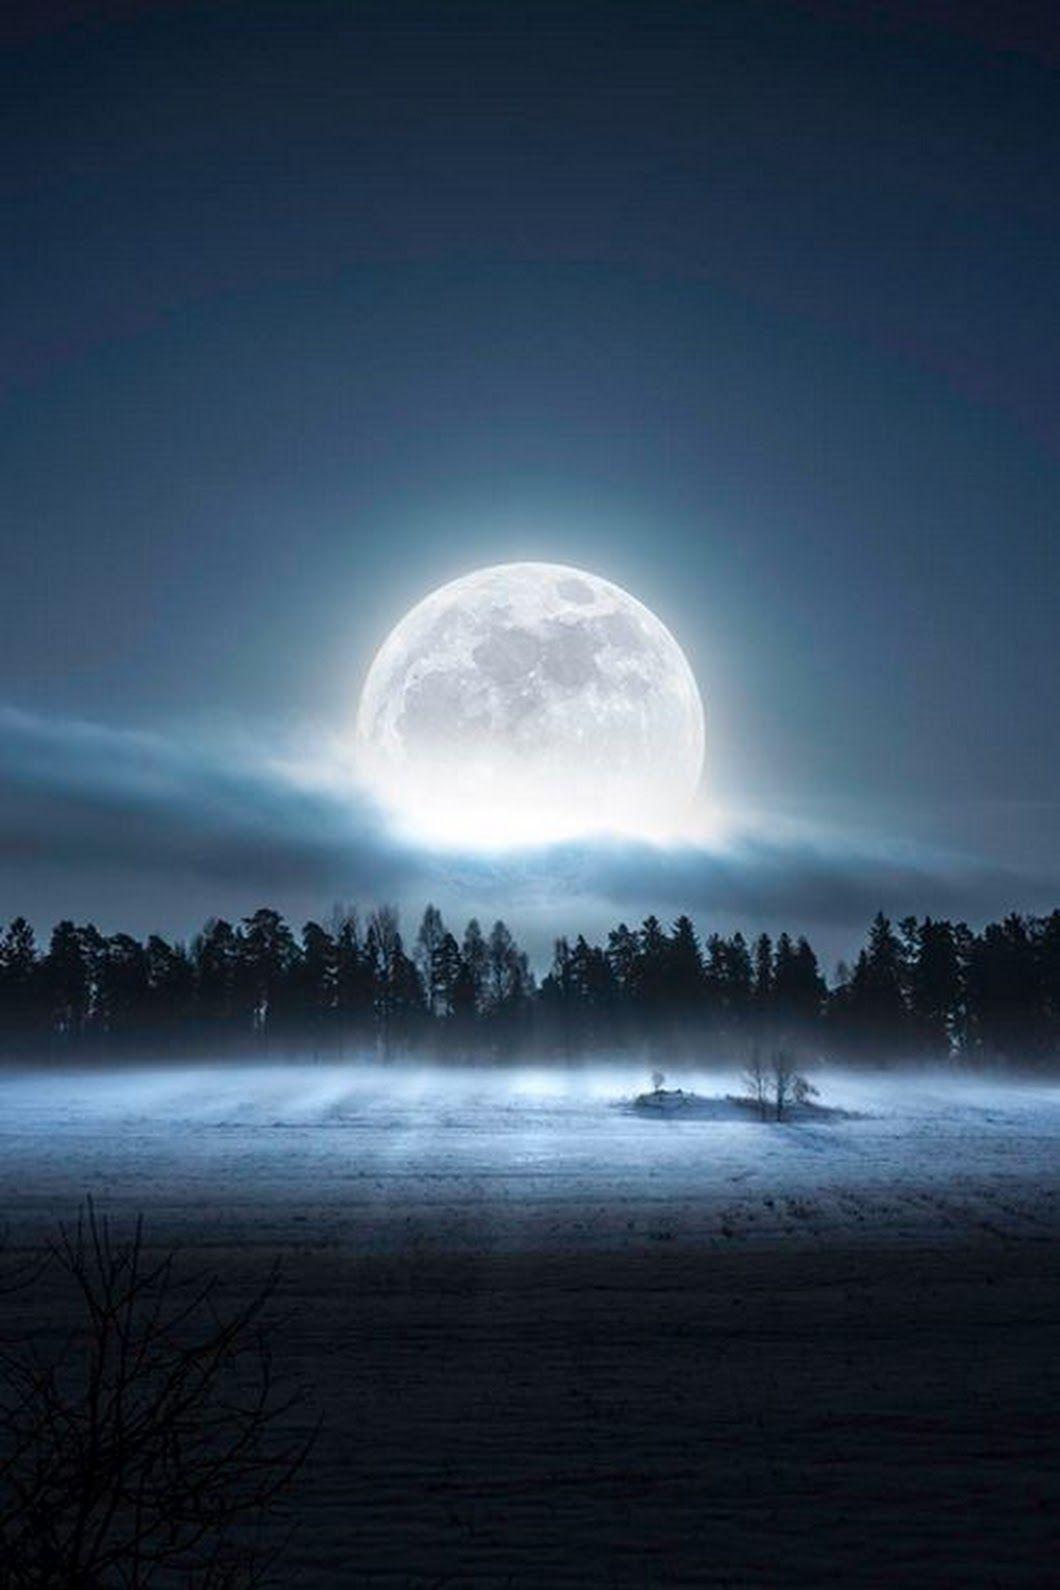 Mystical Magical Moon Beautiful Moon Moon Pictures Good Night Moon